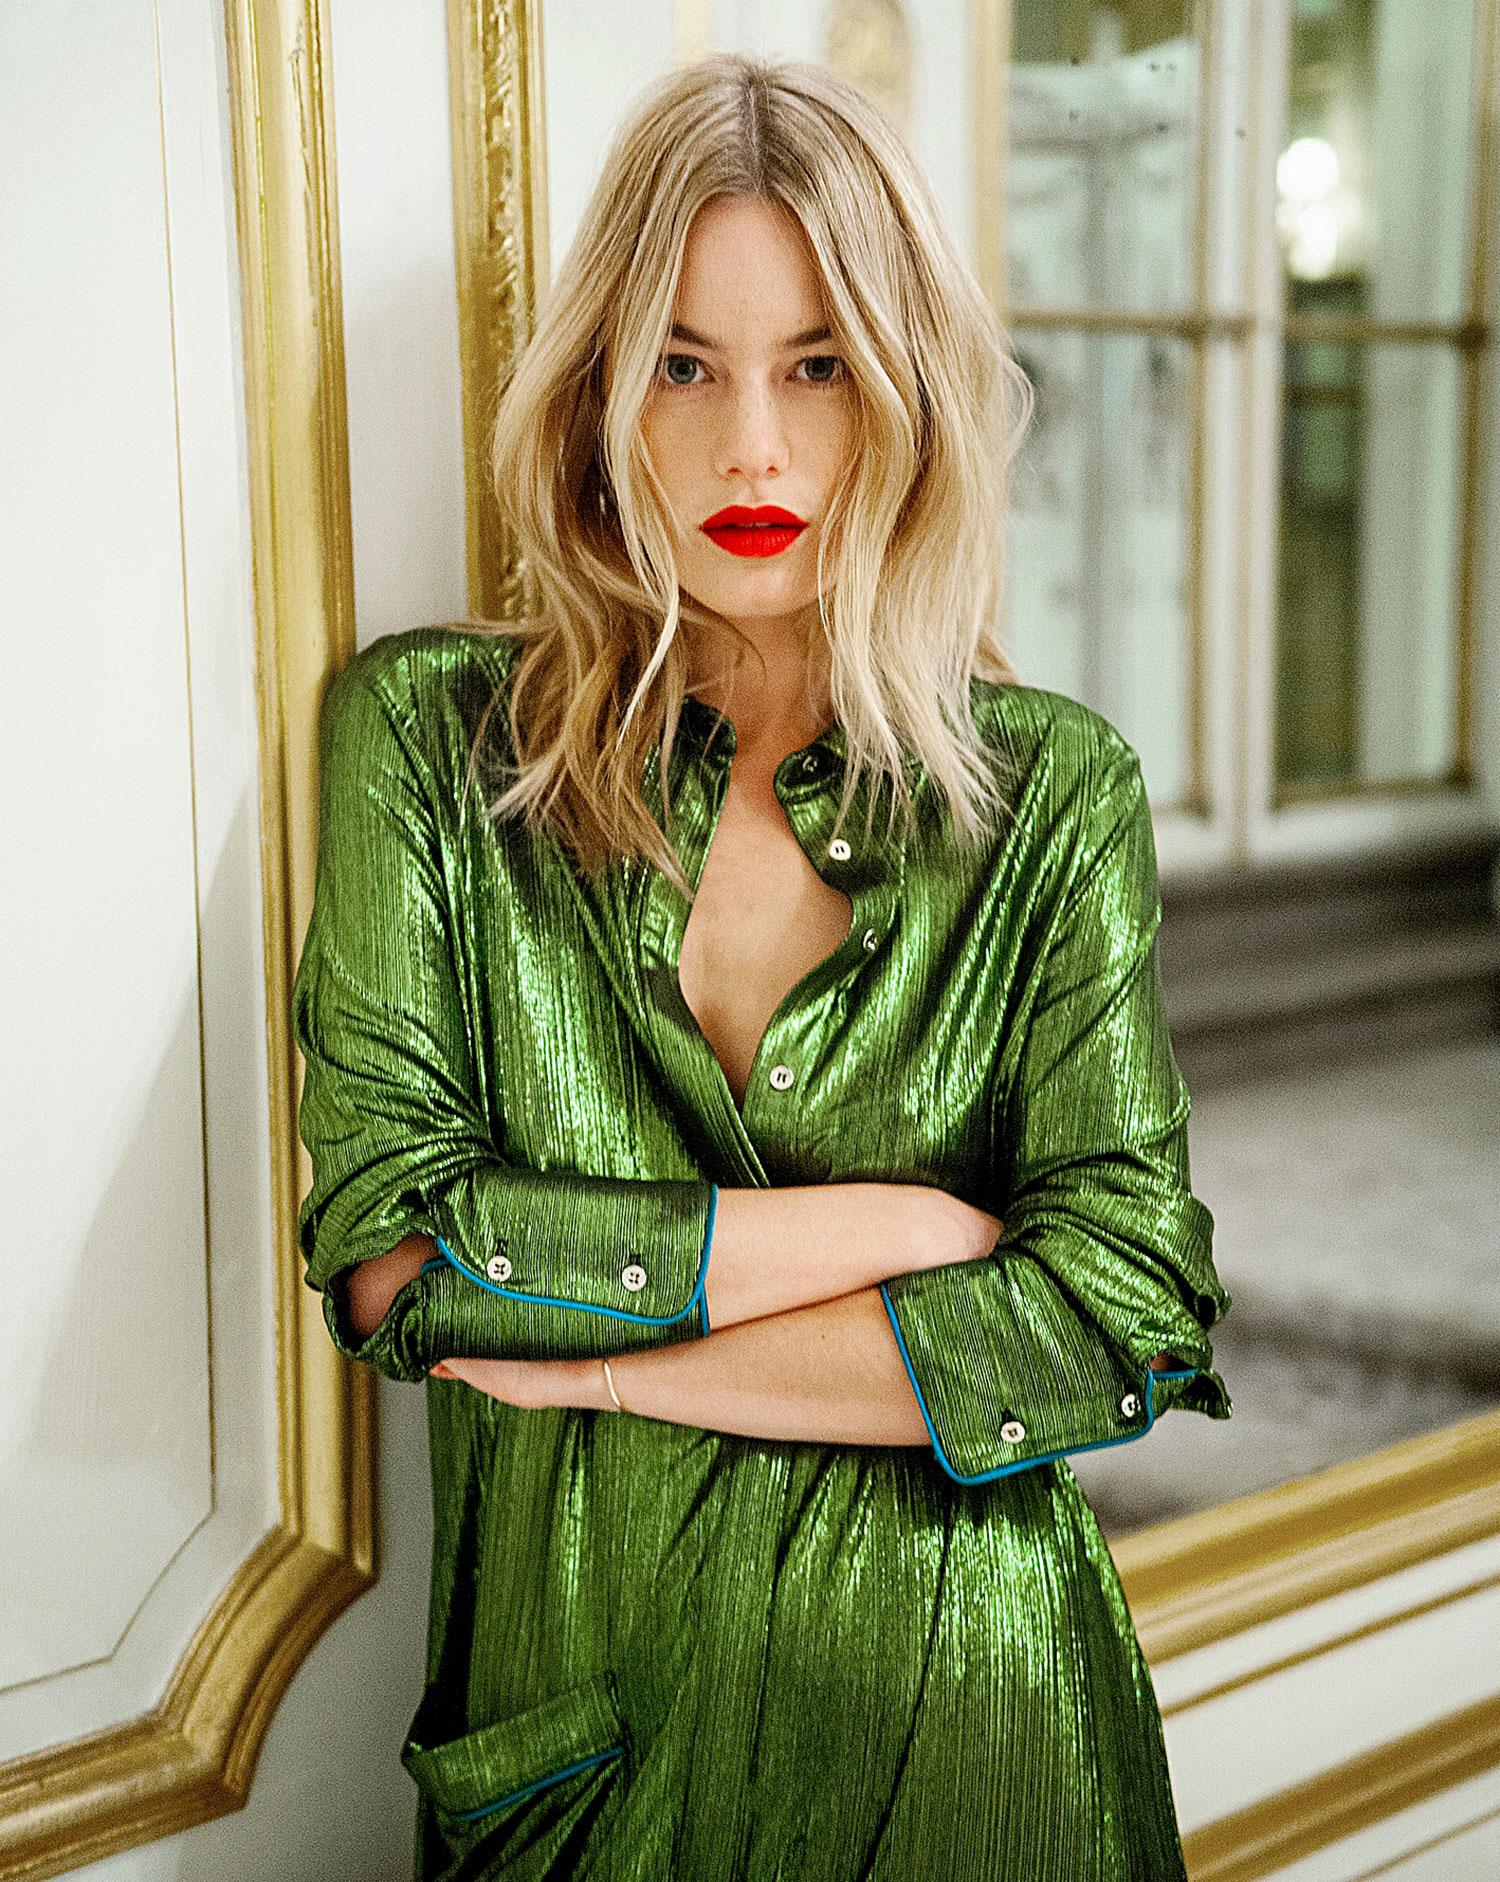 1582b627b1b La leçon de mode de Camille Rowe - Madame Figaro